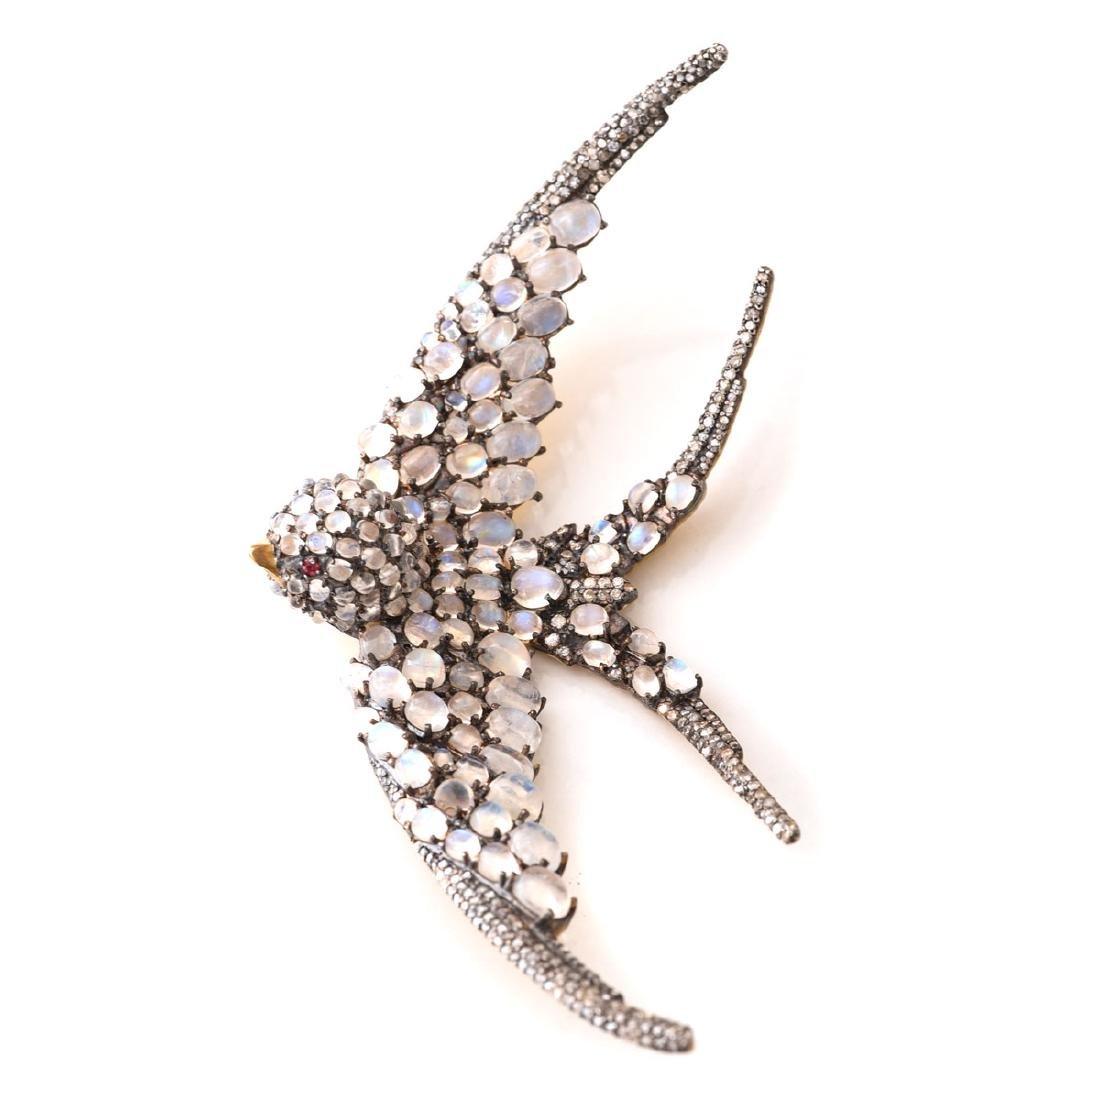 Moonstone, Diamond, Spinel, Silver-Gilt Swallow Pendant